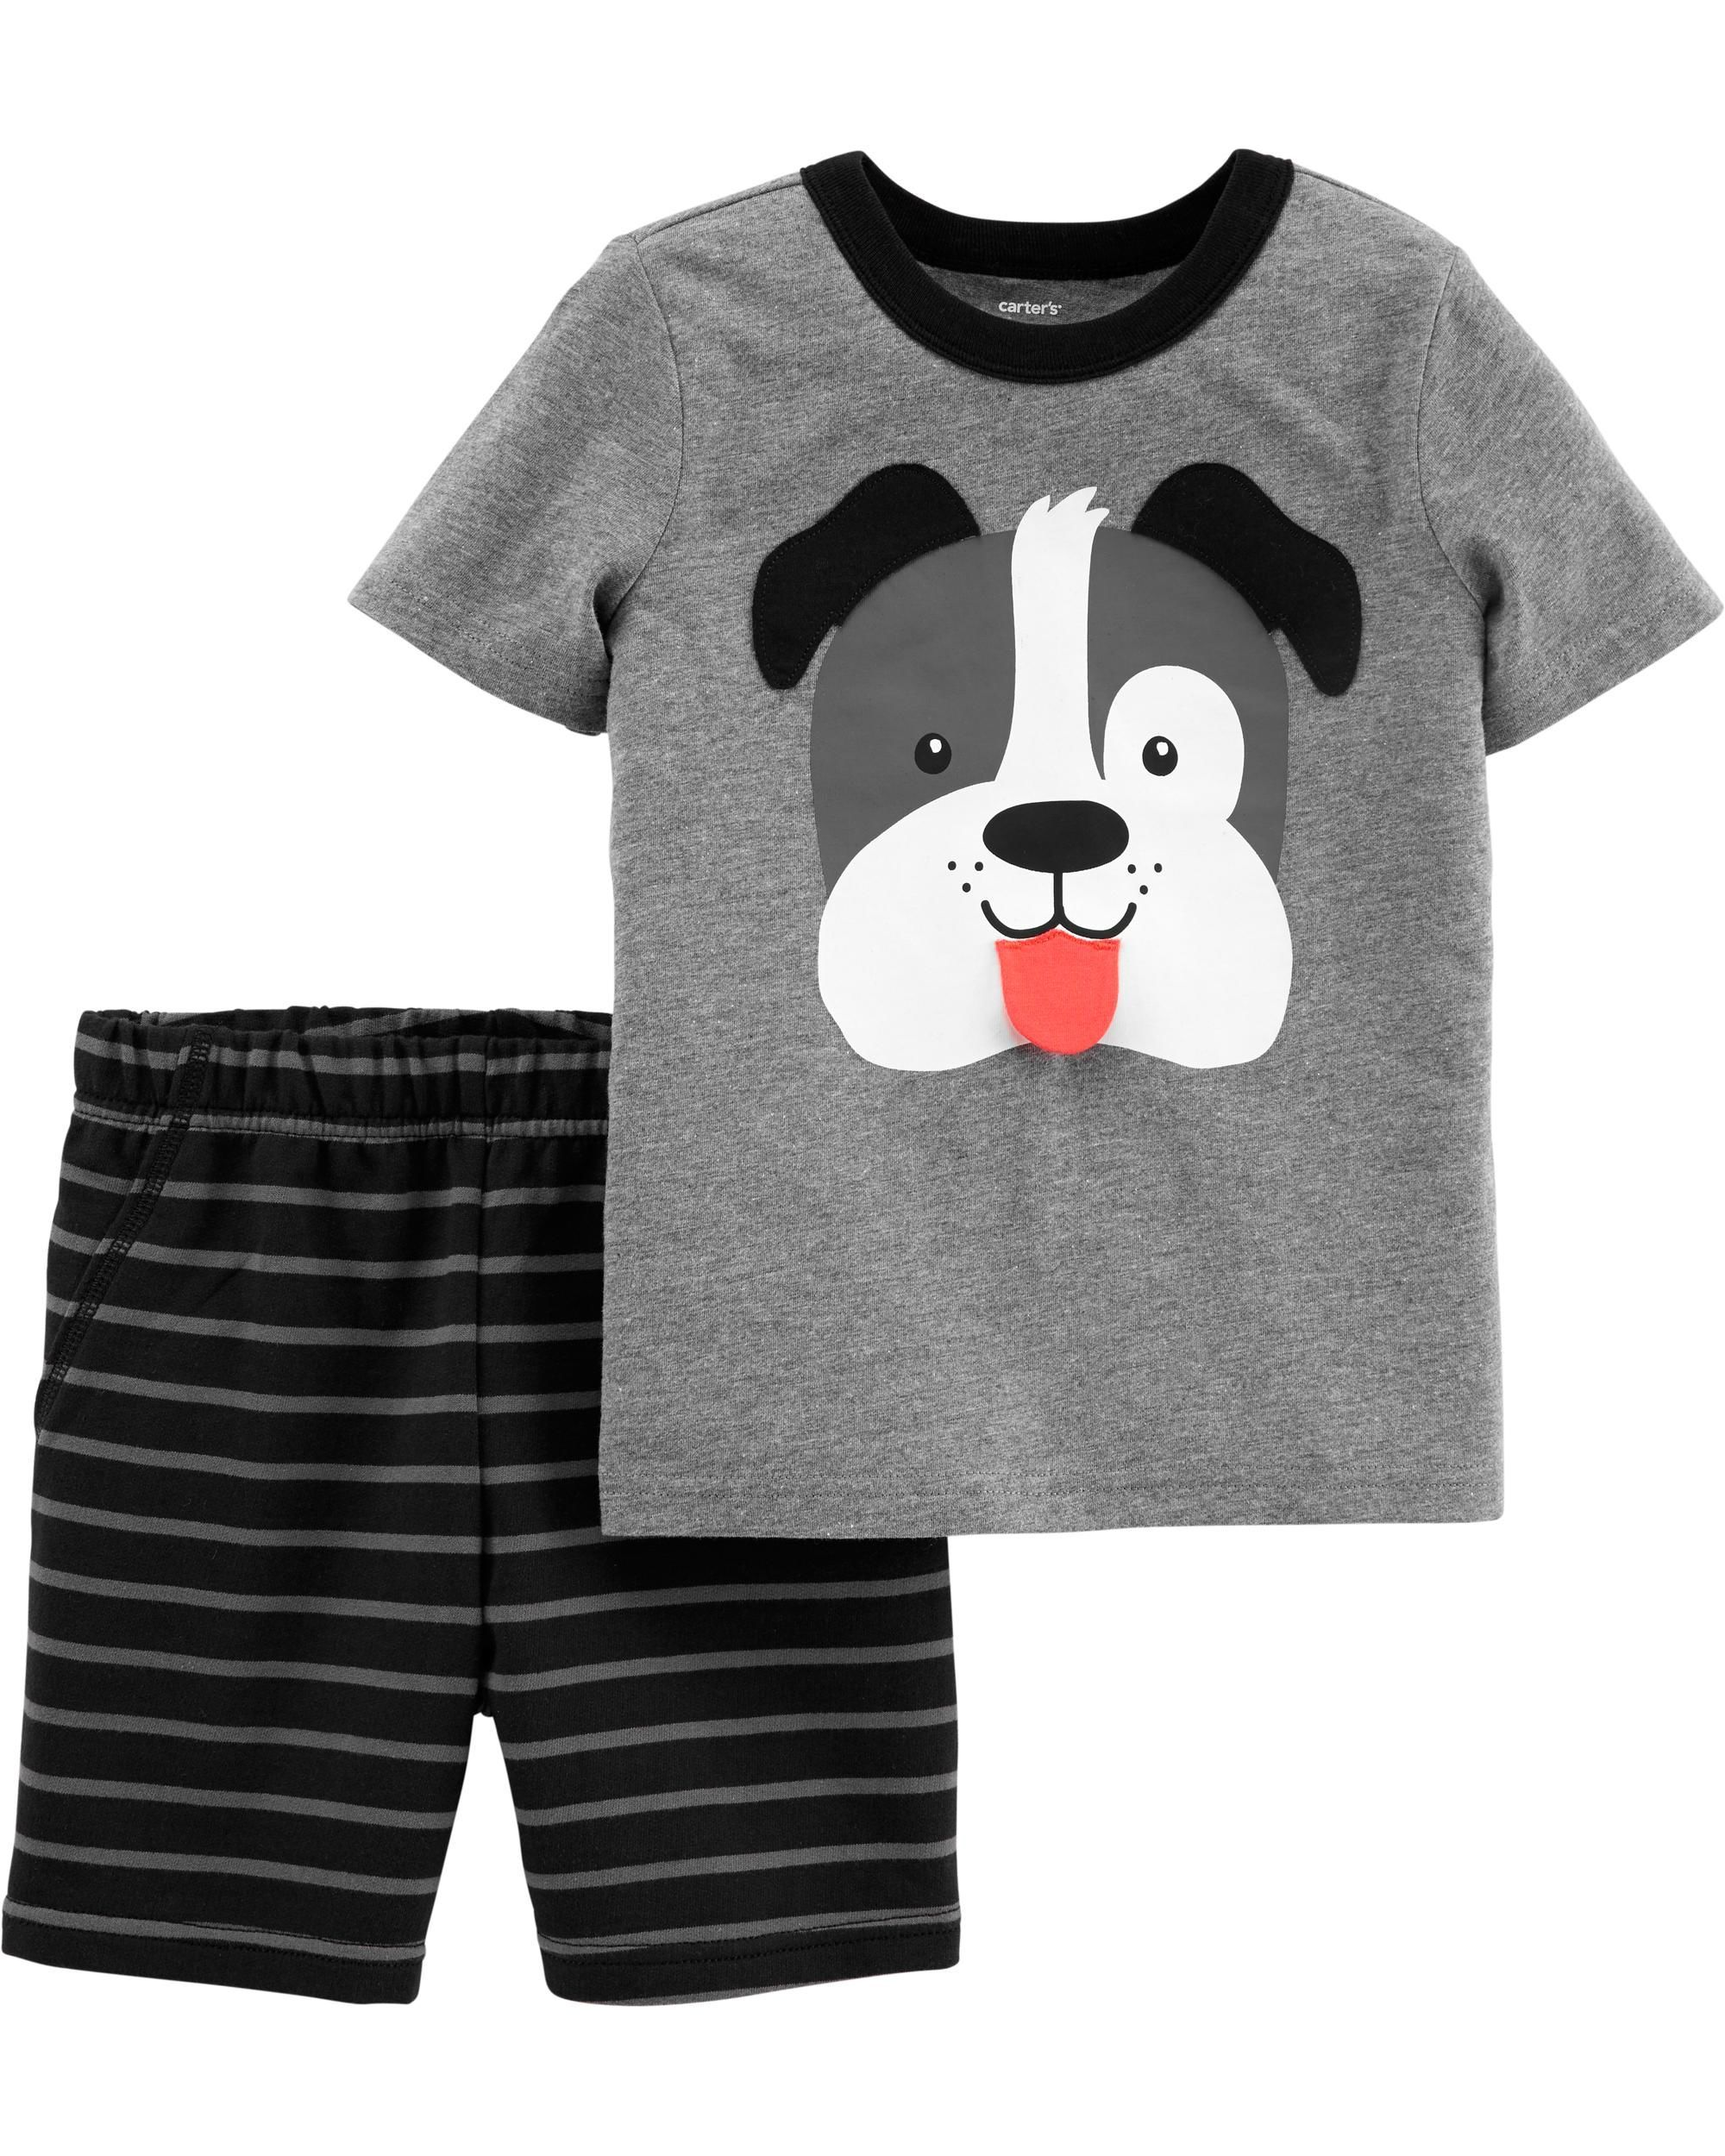 2-Piece Dog Jersey Tee & Striped Short Set | Short sets, Toddler boys,  Carters baby boys